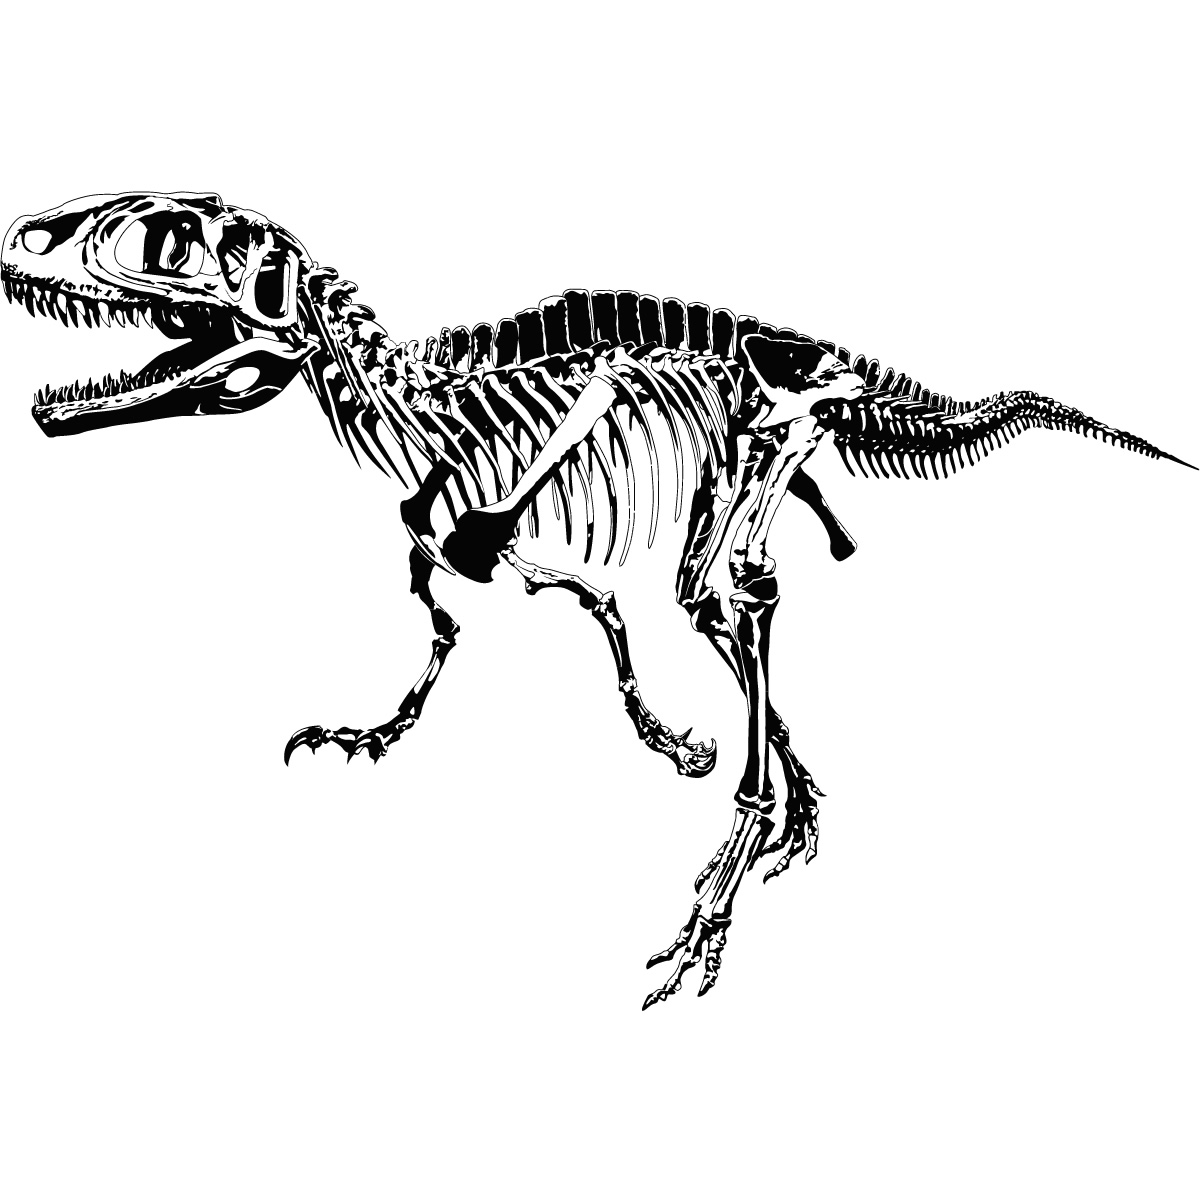 T Rex Skeleton Dinosaurs Wall Art Sticker Wall Decal Transfers